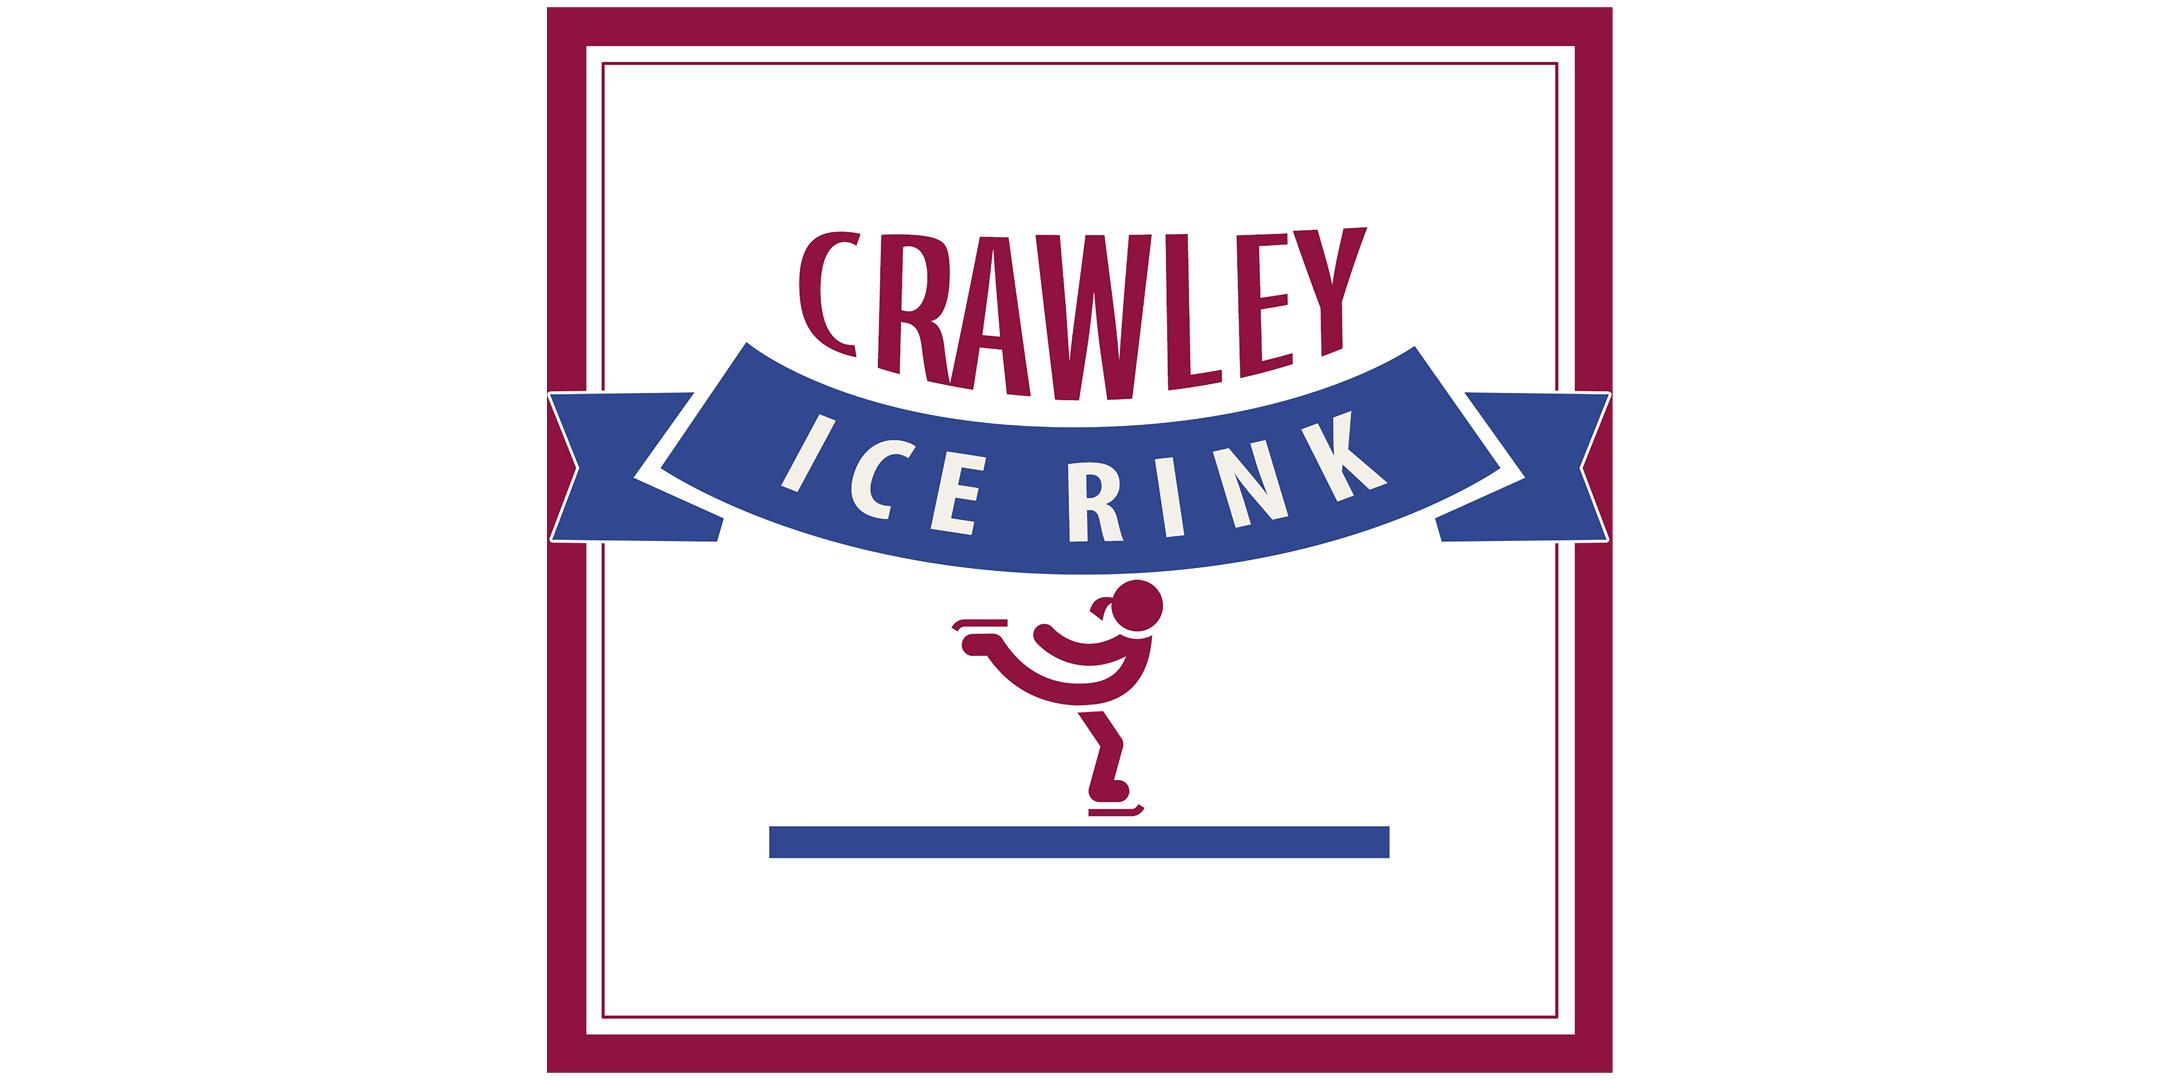 Crawley Ice Rink - 8th December (Off Peak)